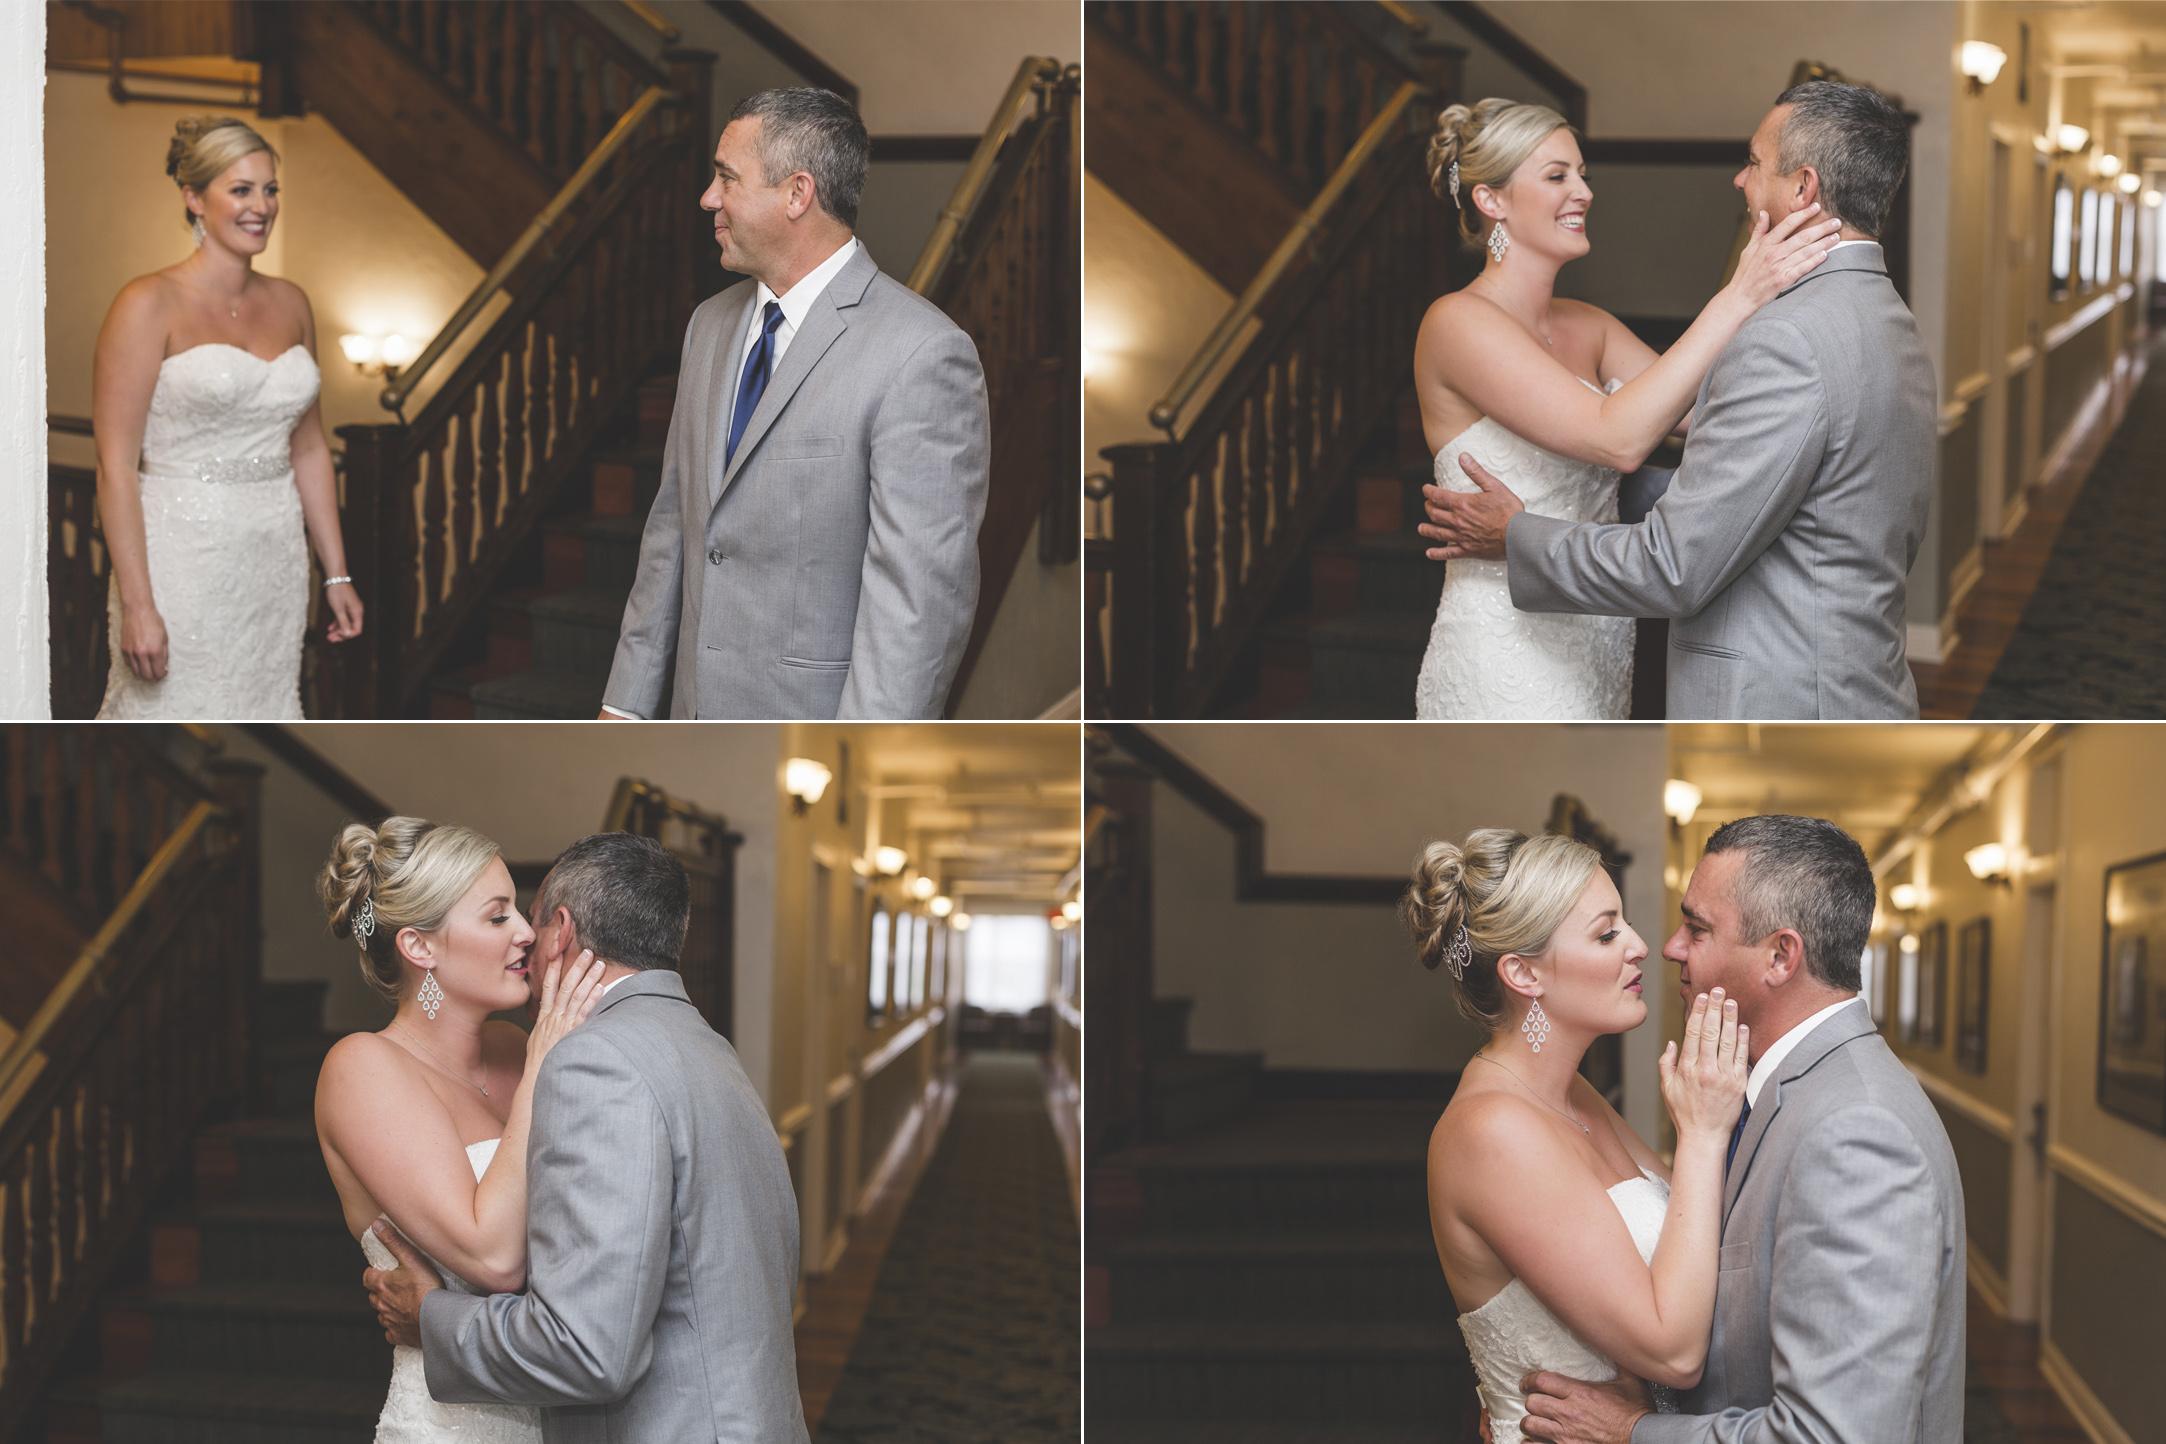 adam-szarmack-casa-marina-wedding-photographer-jacksonville-beach-florida-19.jpg